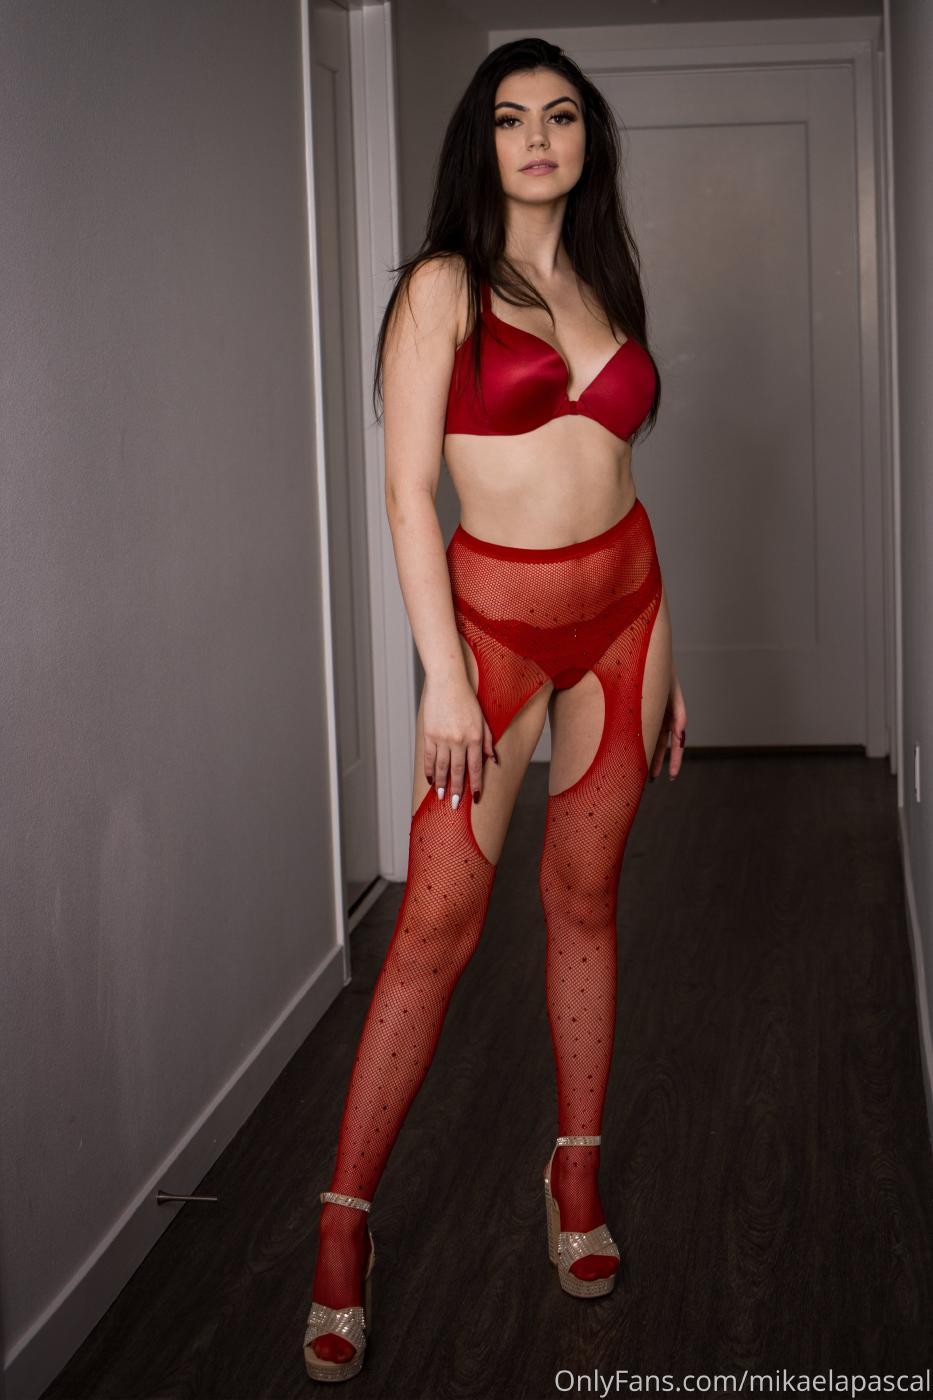 Mikaela Pascal Red Lingerie Onlyfans Set Leaked Shzram